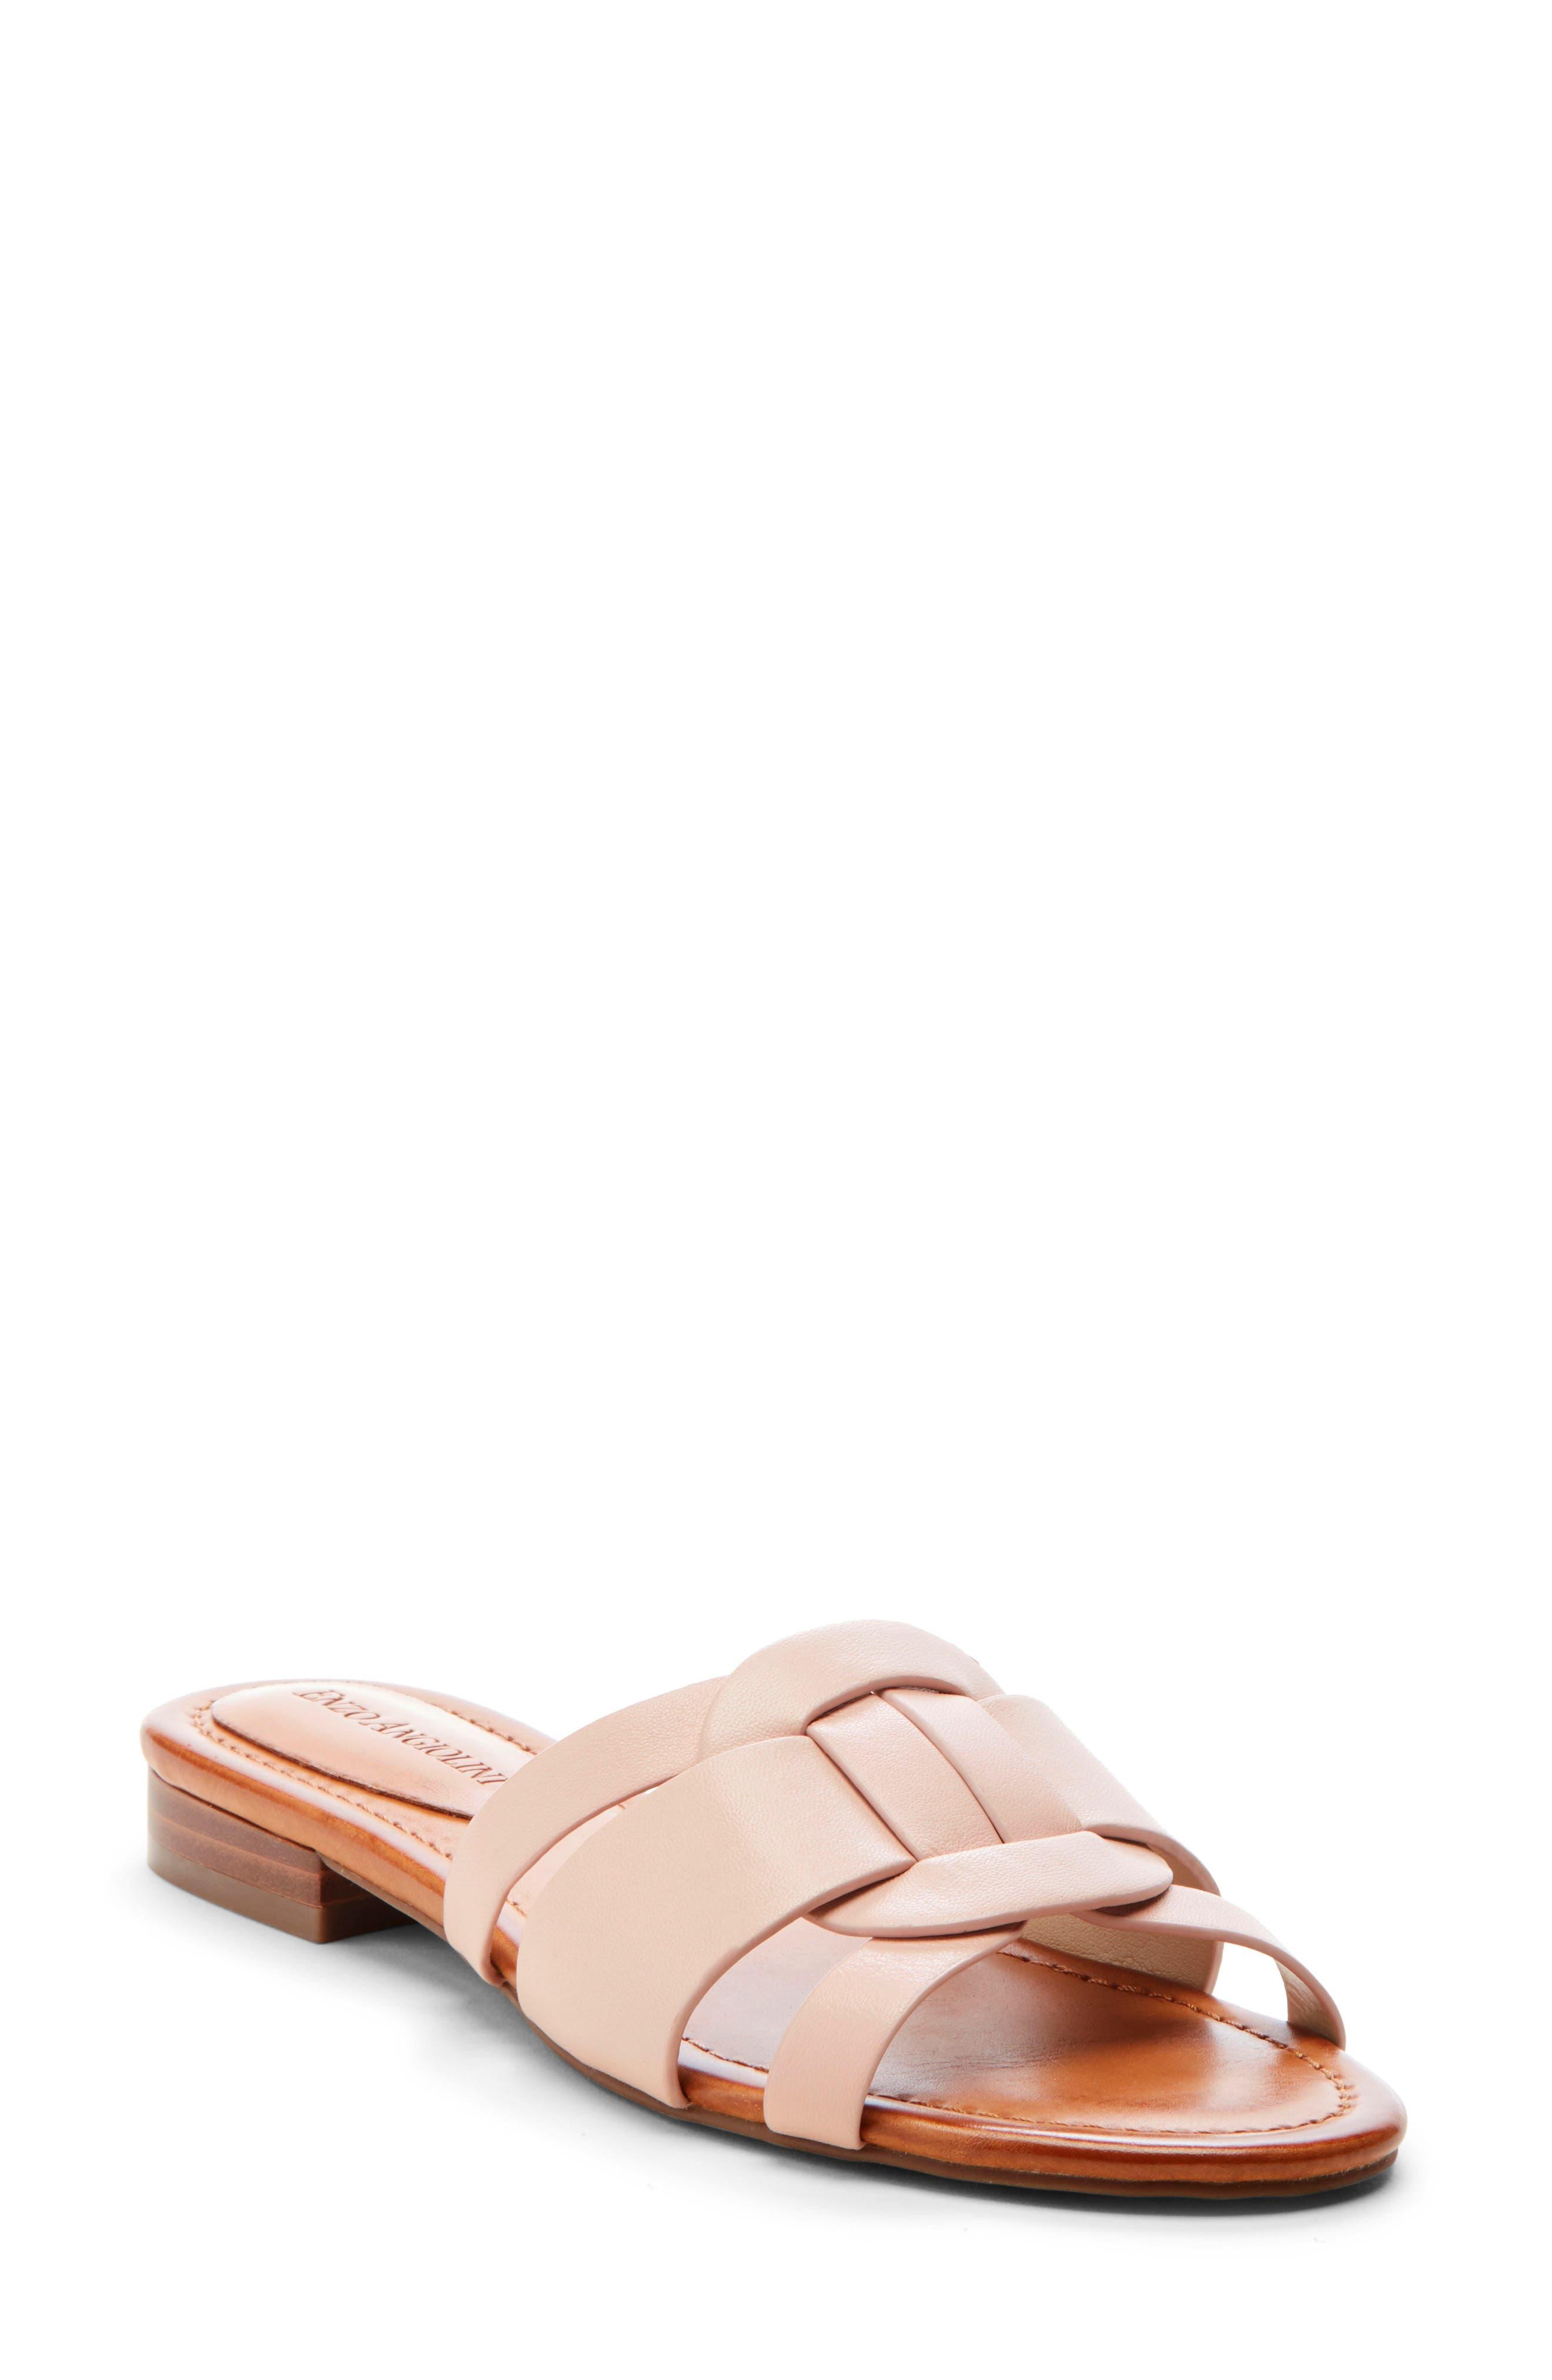 Enzo Angiolini Golda Slide Sandal, Pink